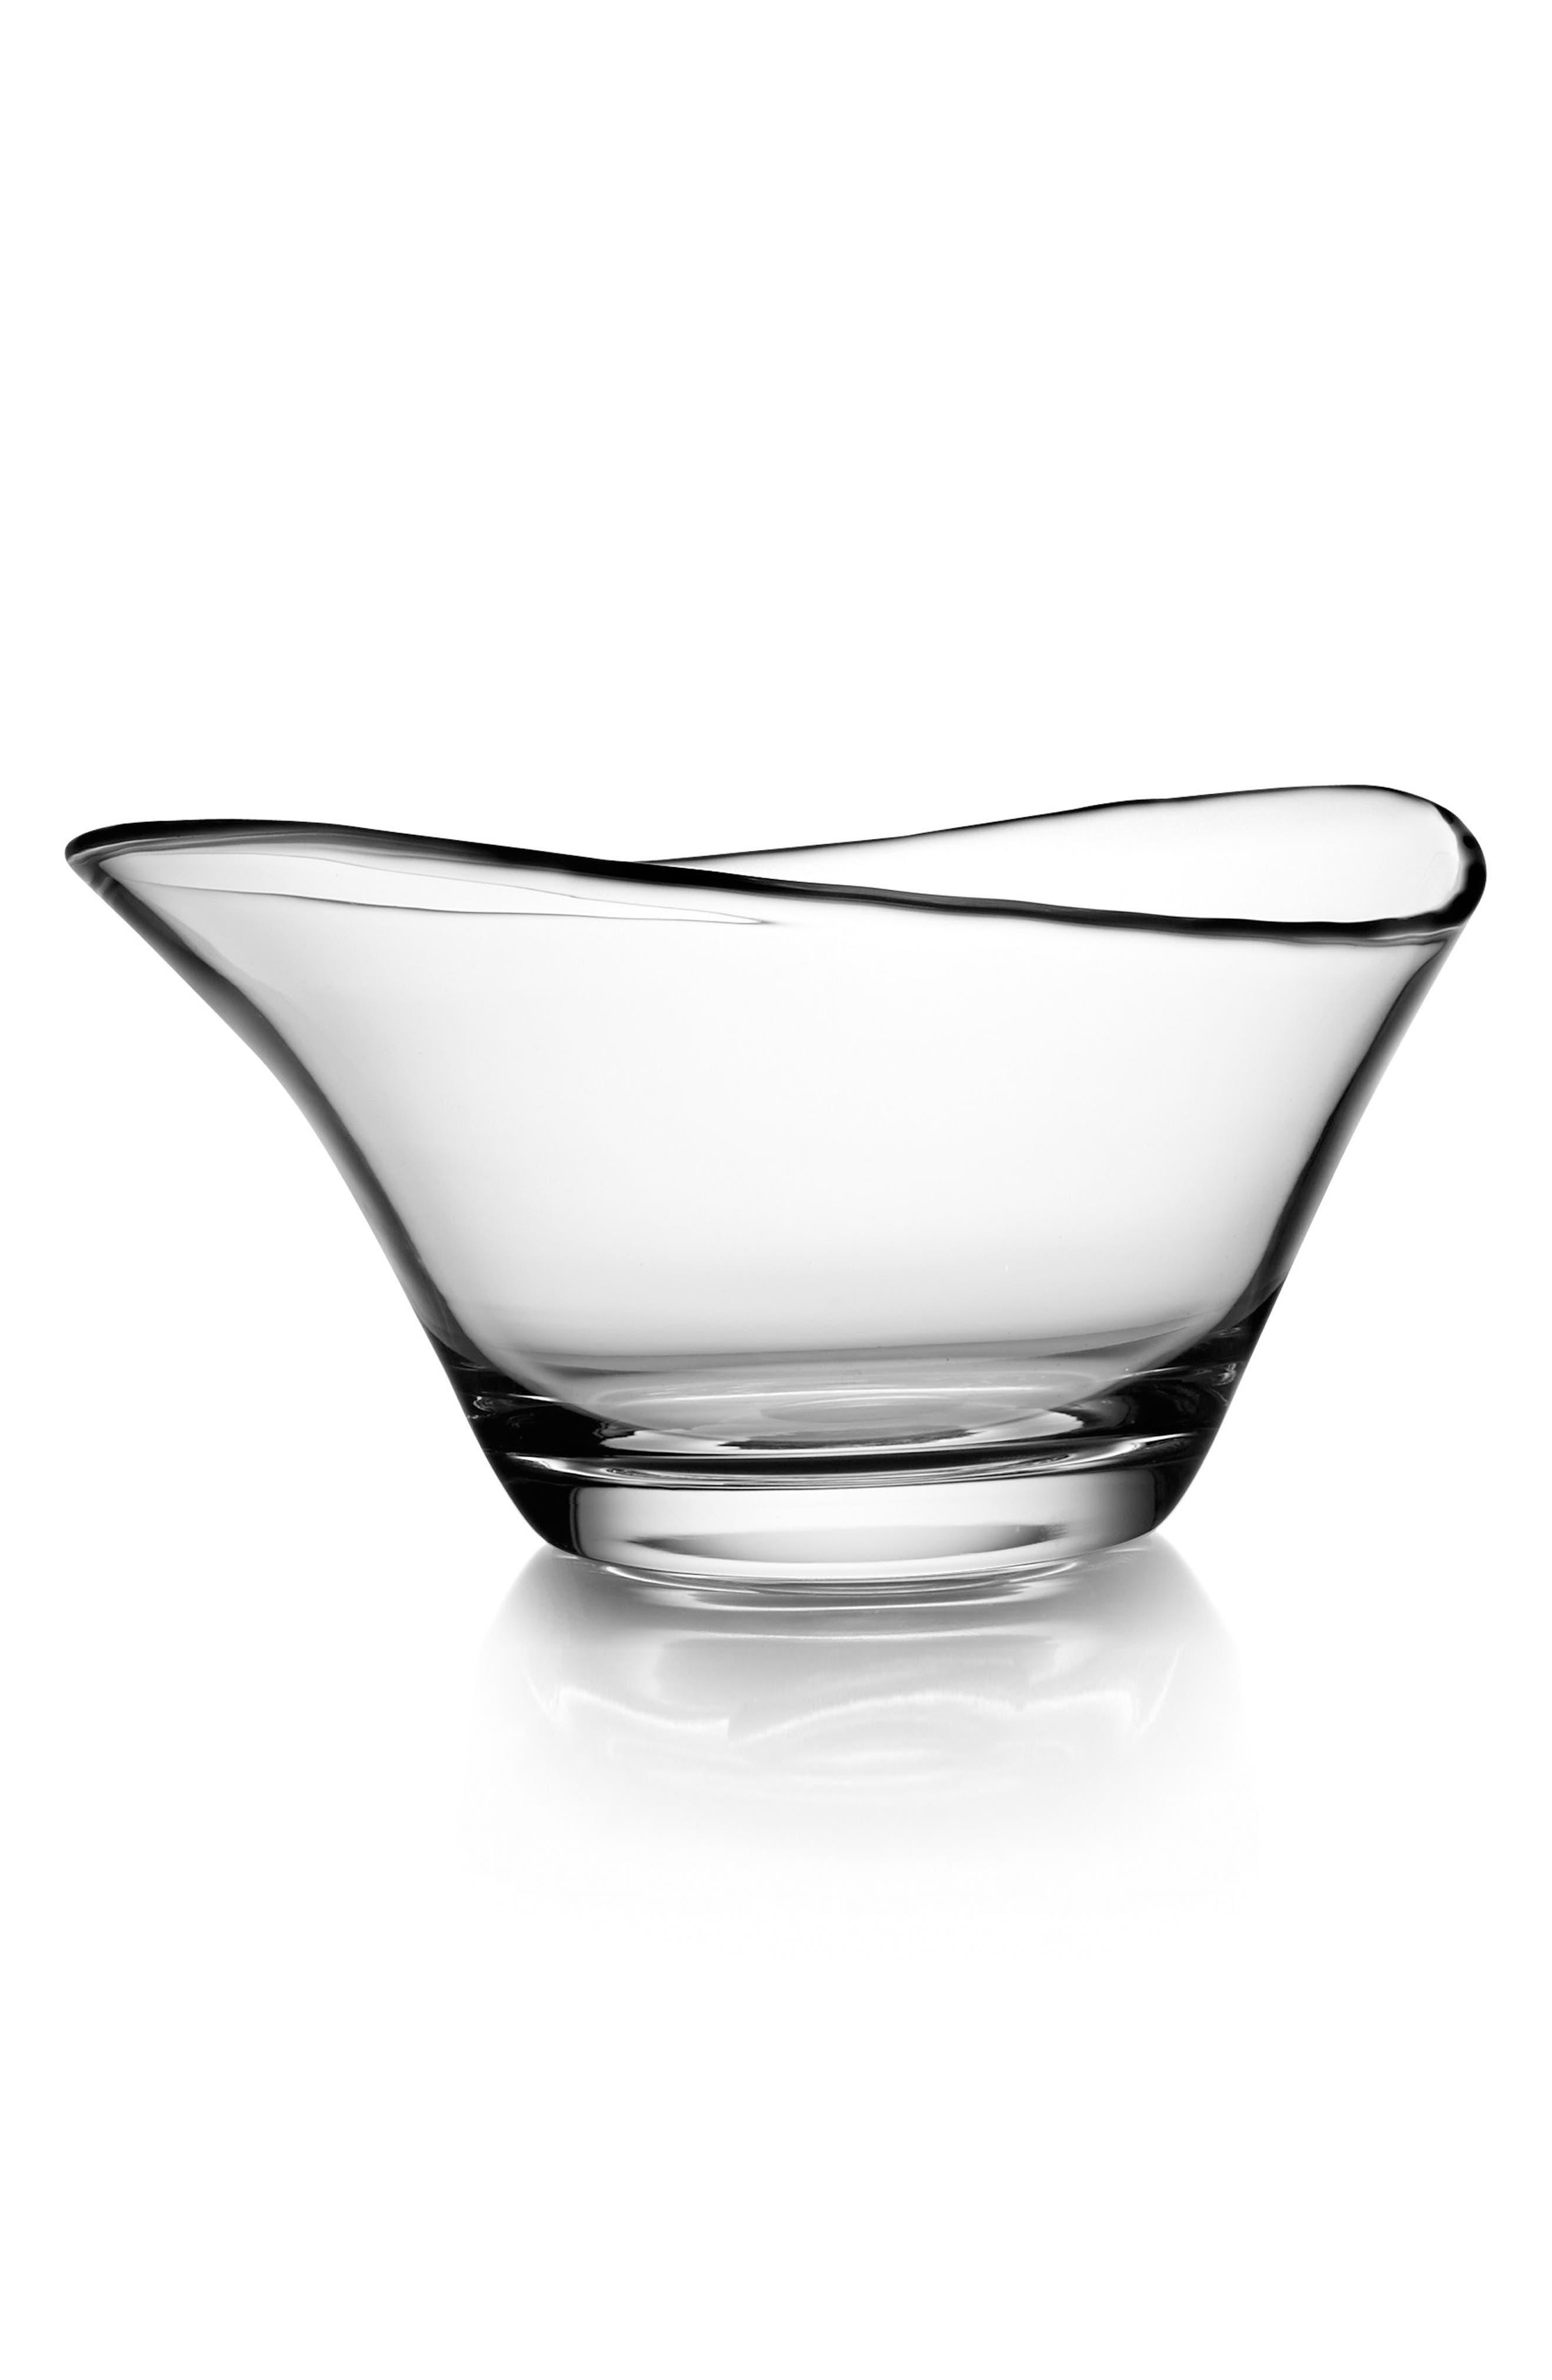 Large Moderne Bowl,                             Main thumbnail 1, color,